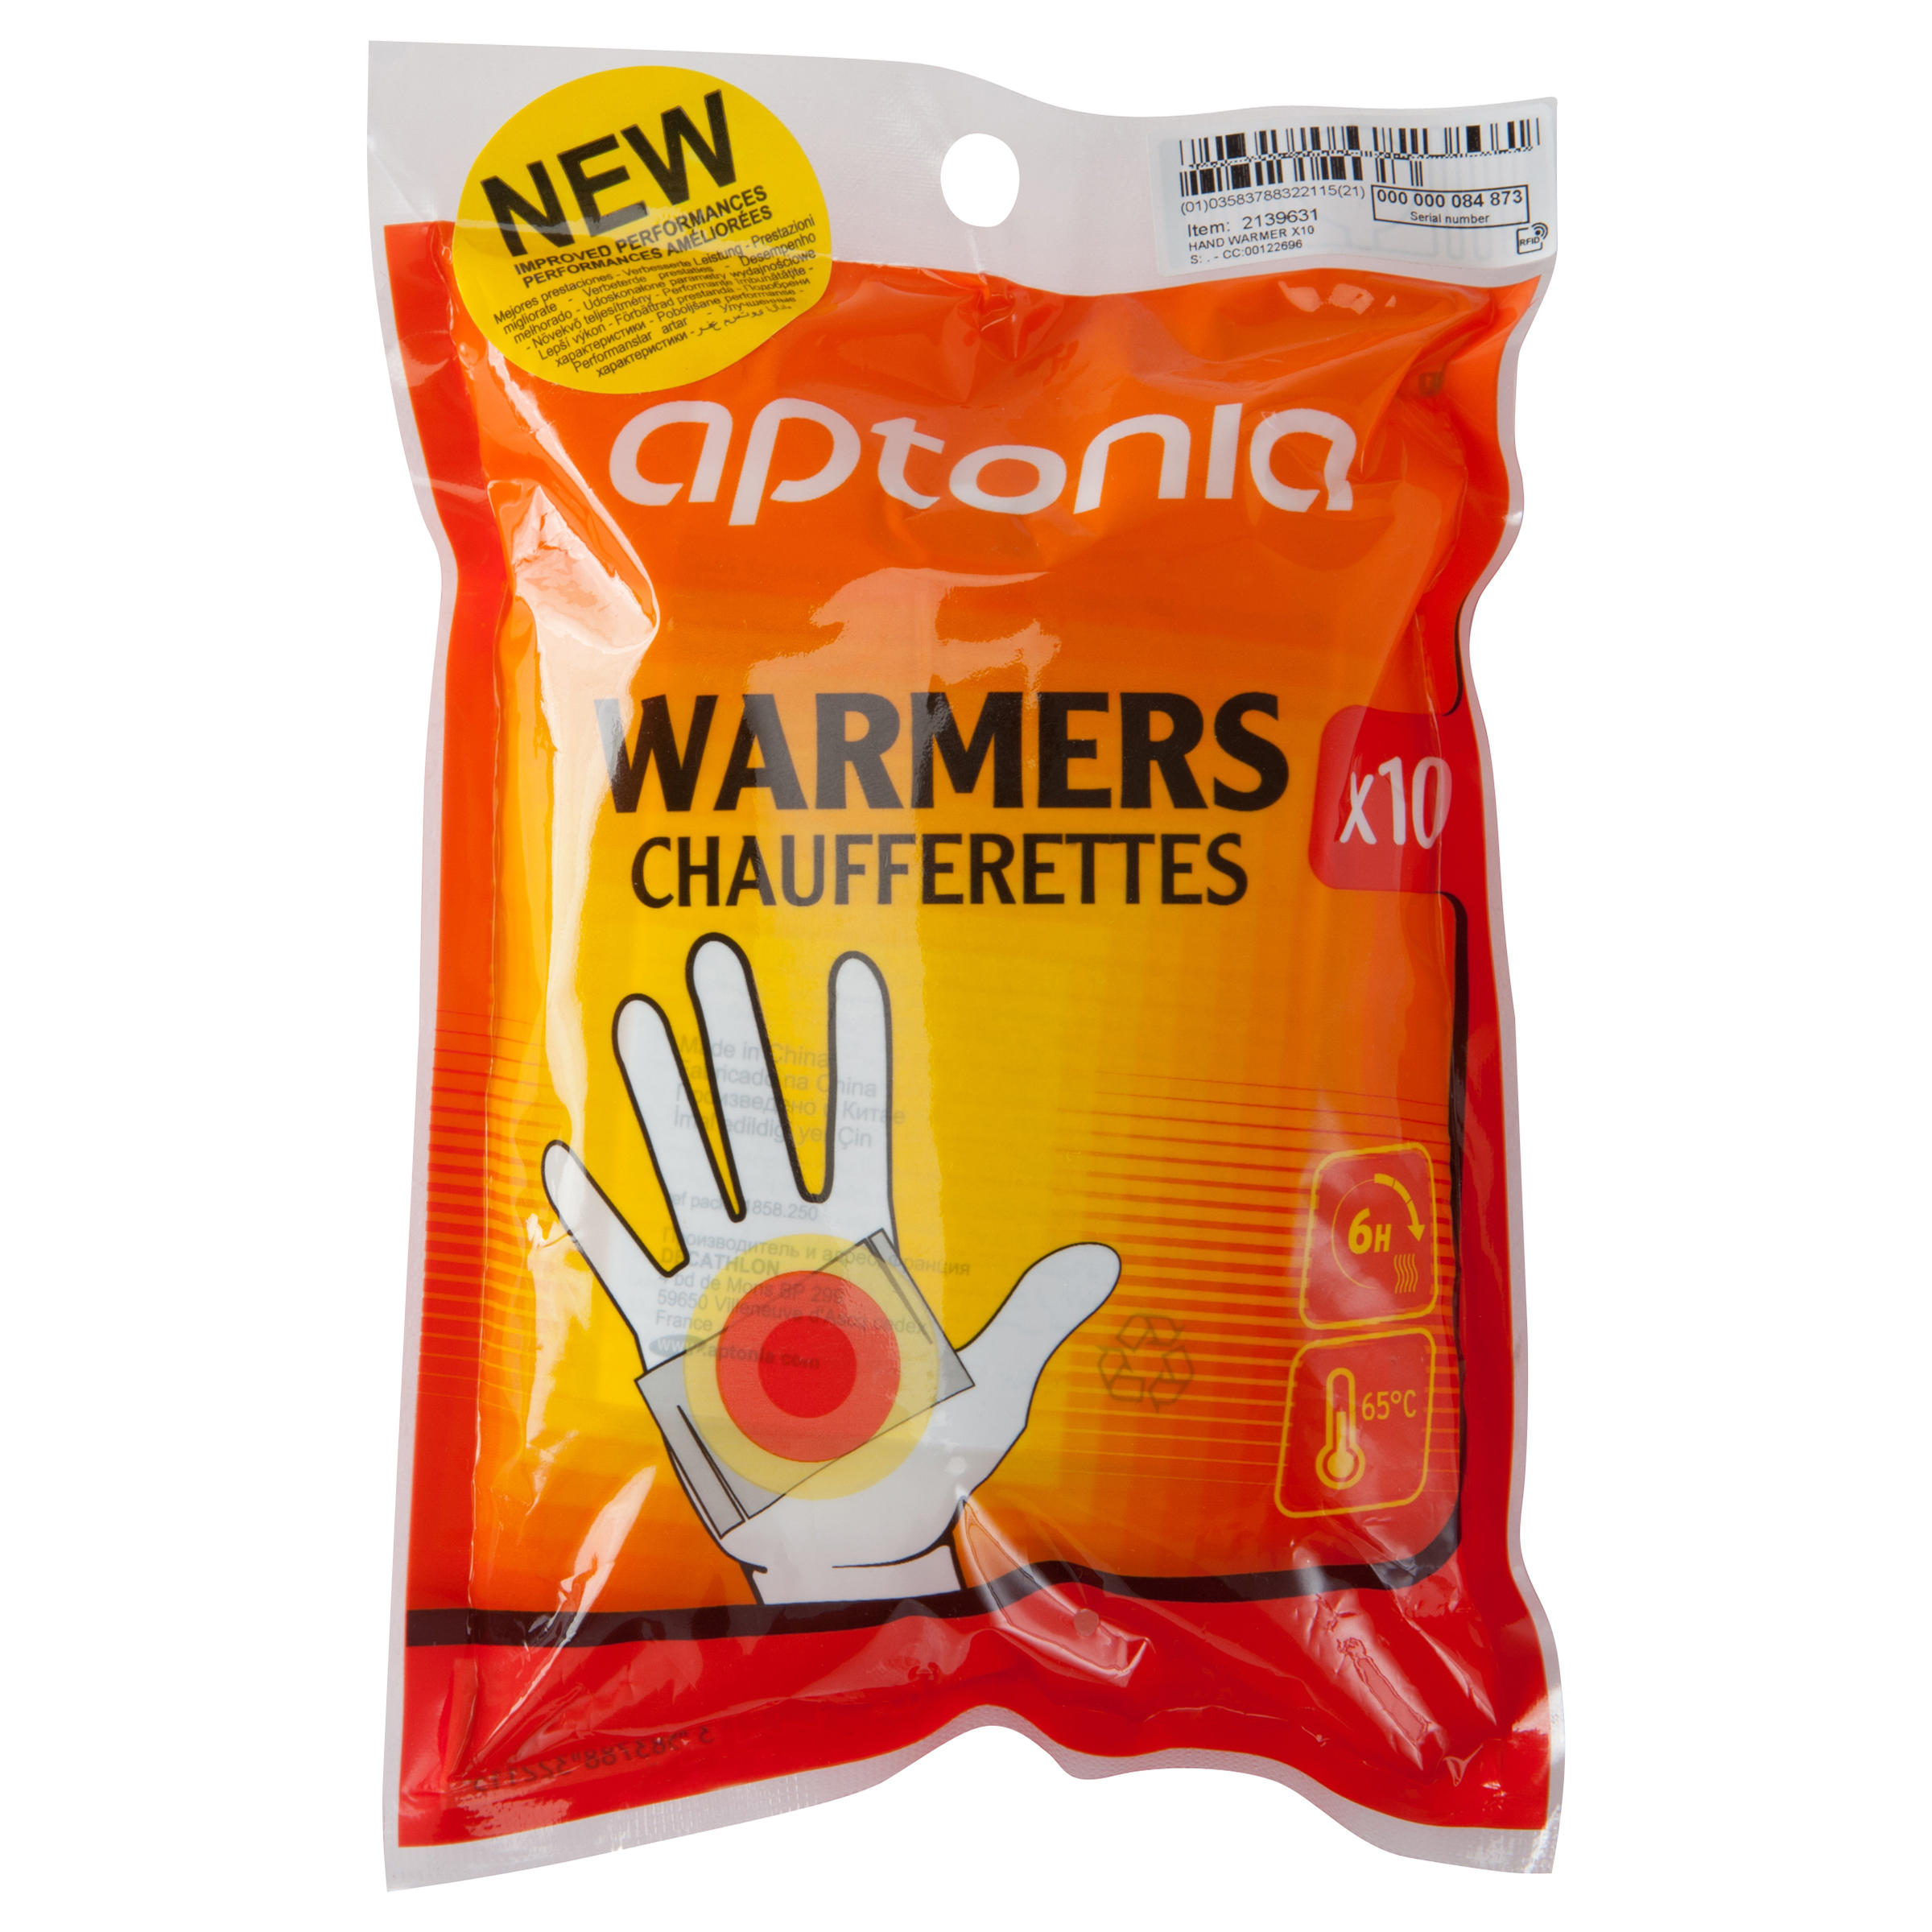 Aptonia Handwarmers X 10 thumbnail